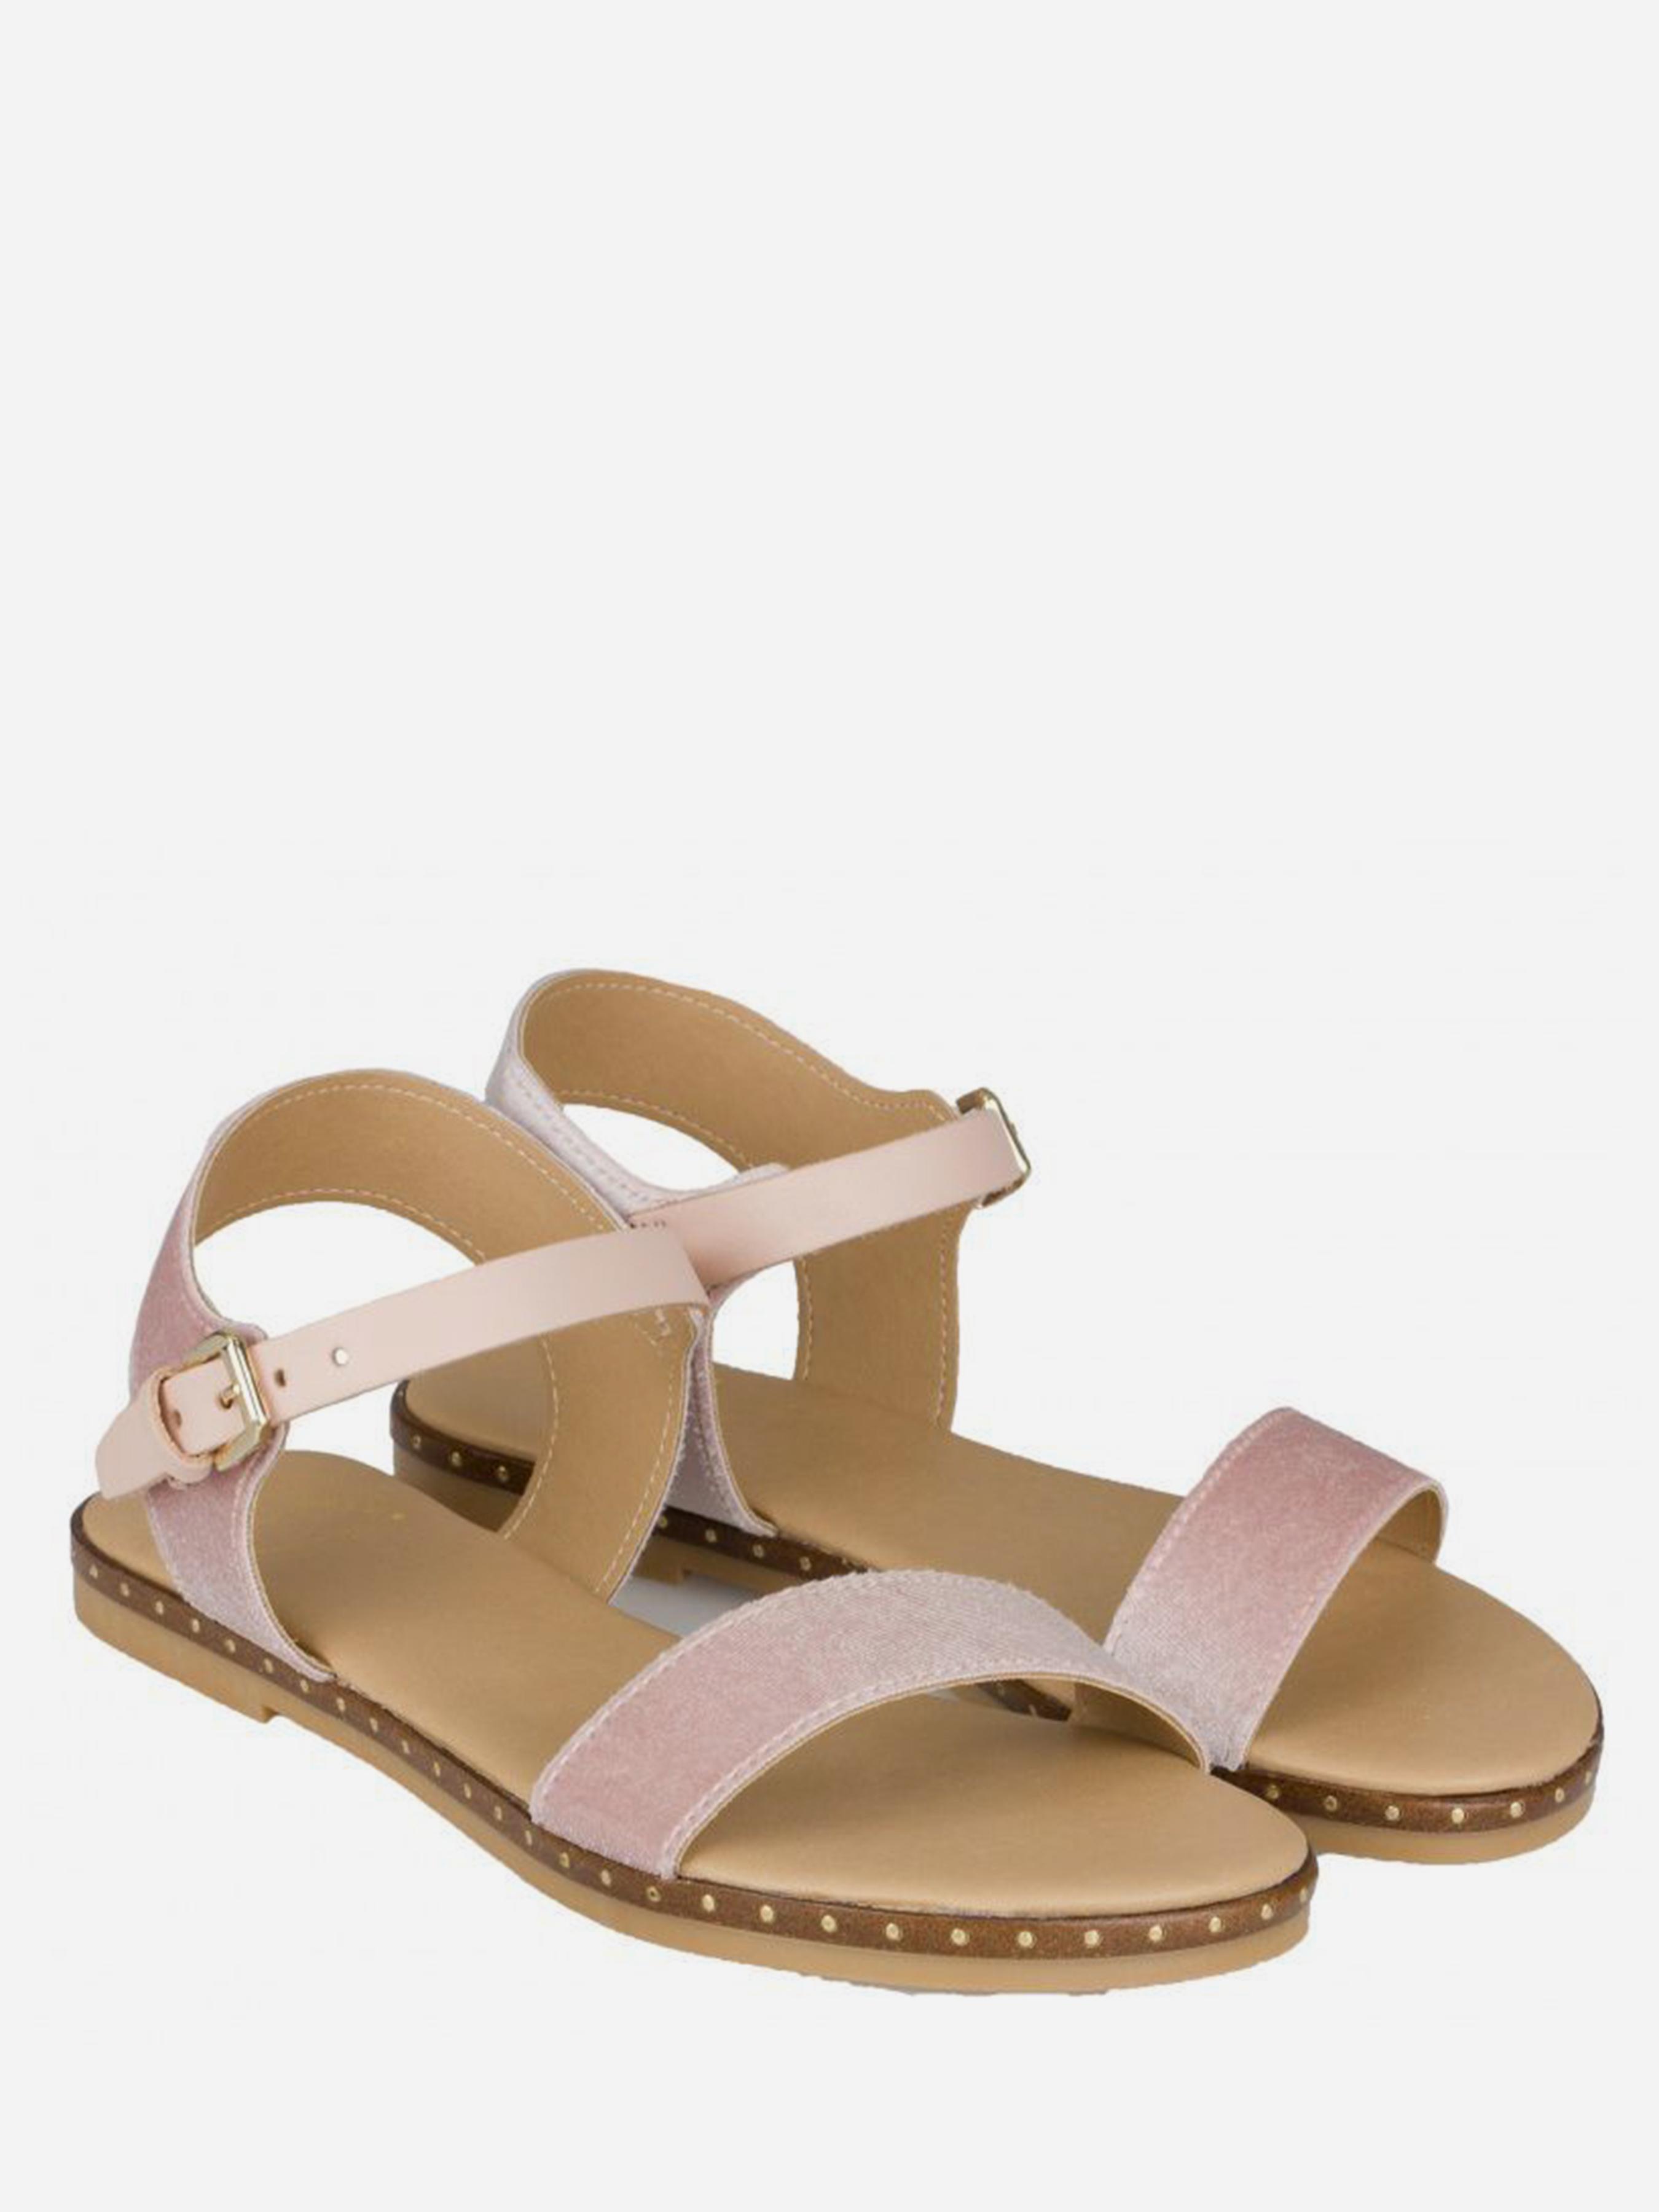 Сандалии для женщин Casta & Dolly 1Z4 модная обувь, 2017